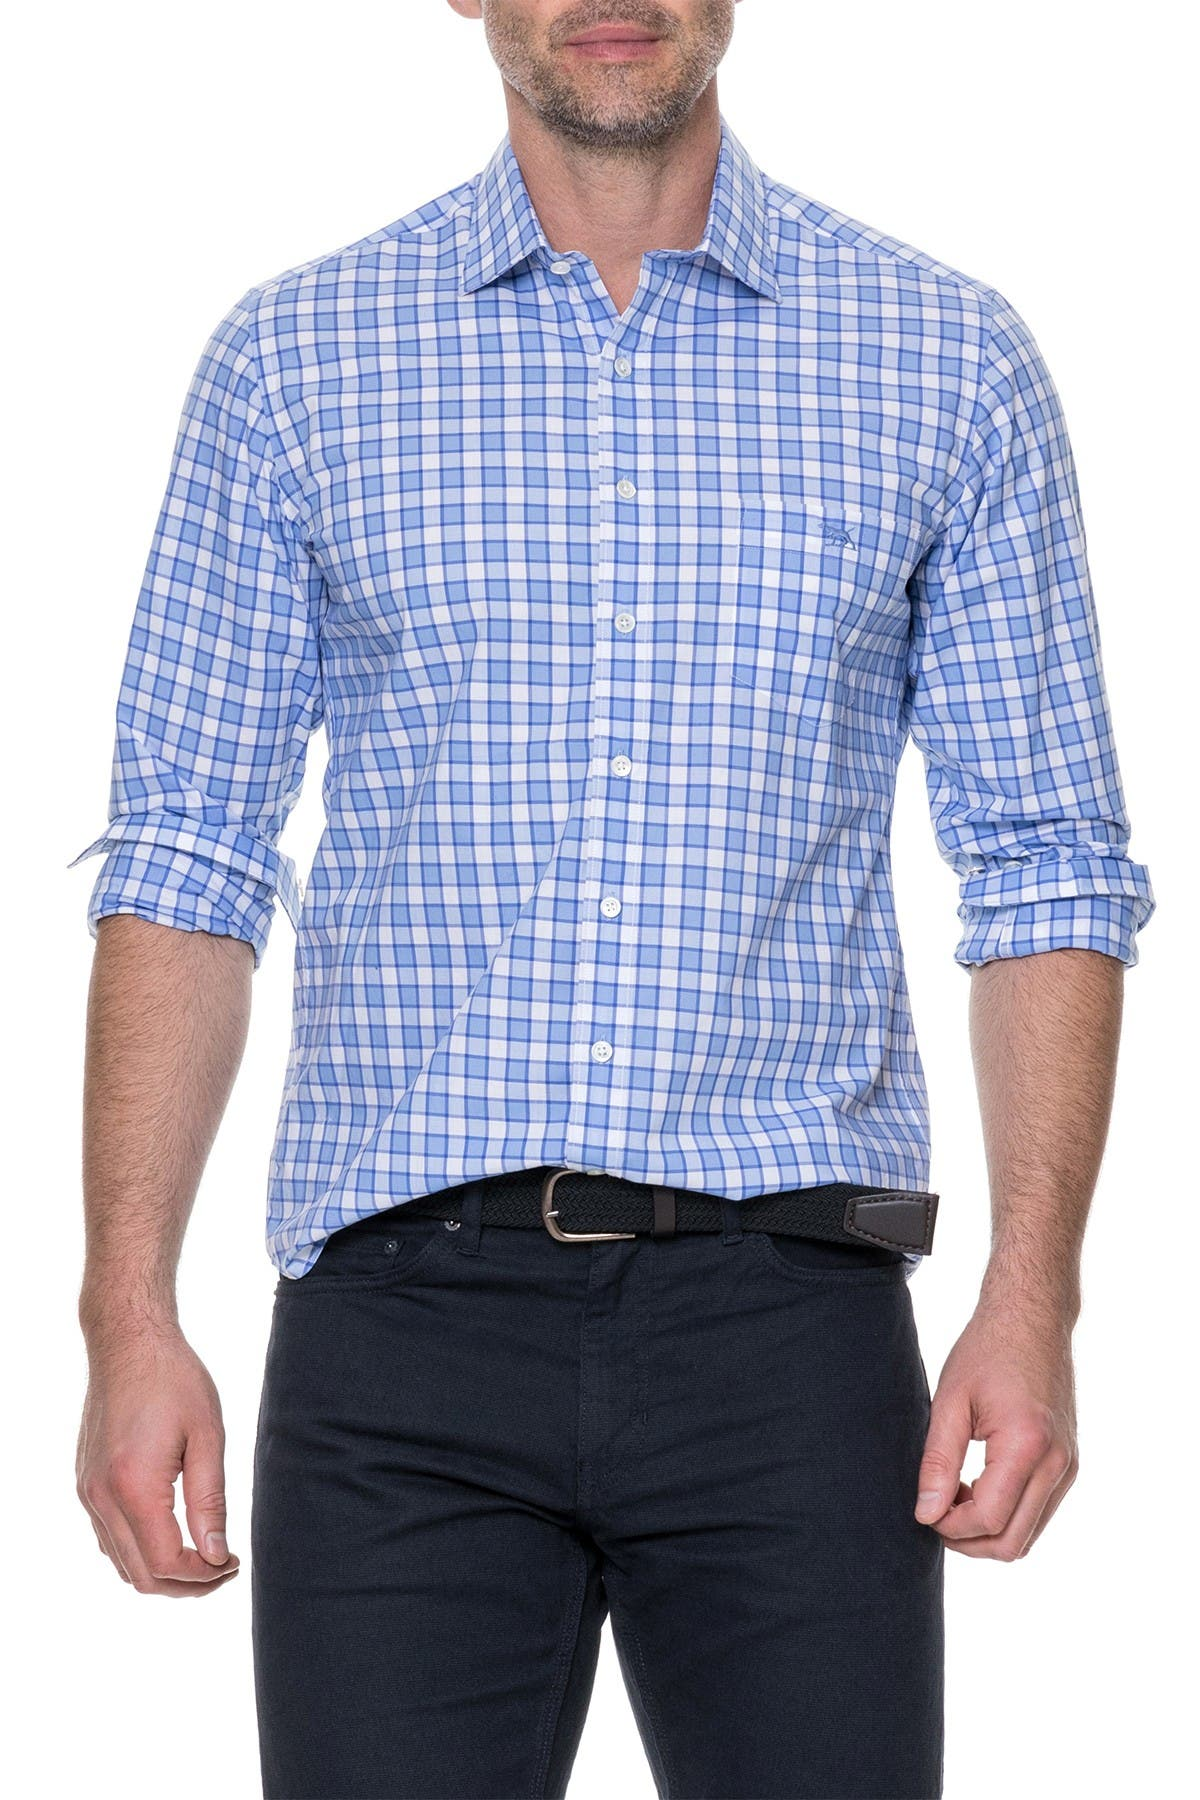 Image of RODD AND GUNN Cedarwood Long Sleeve Shirt